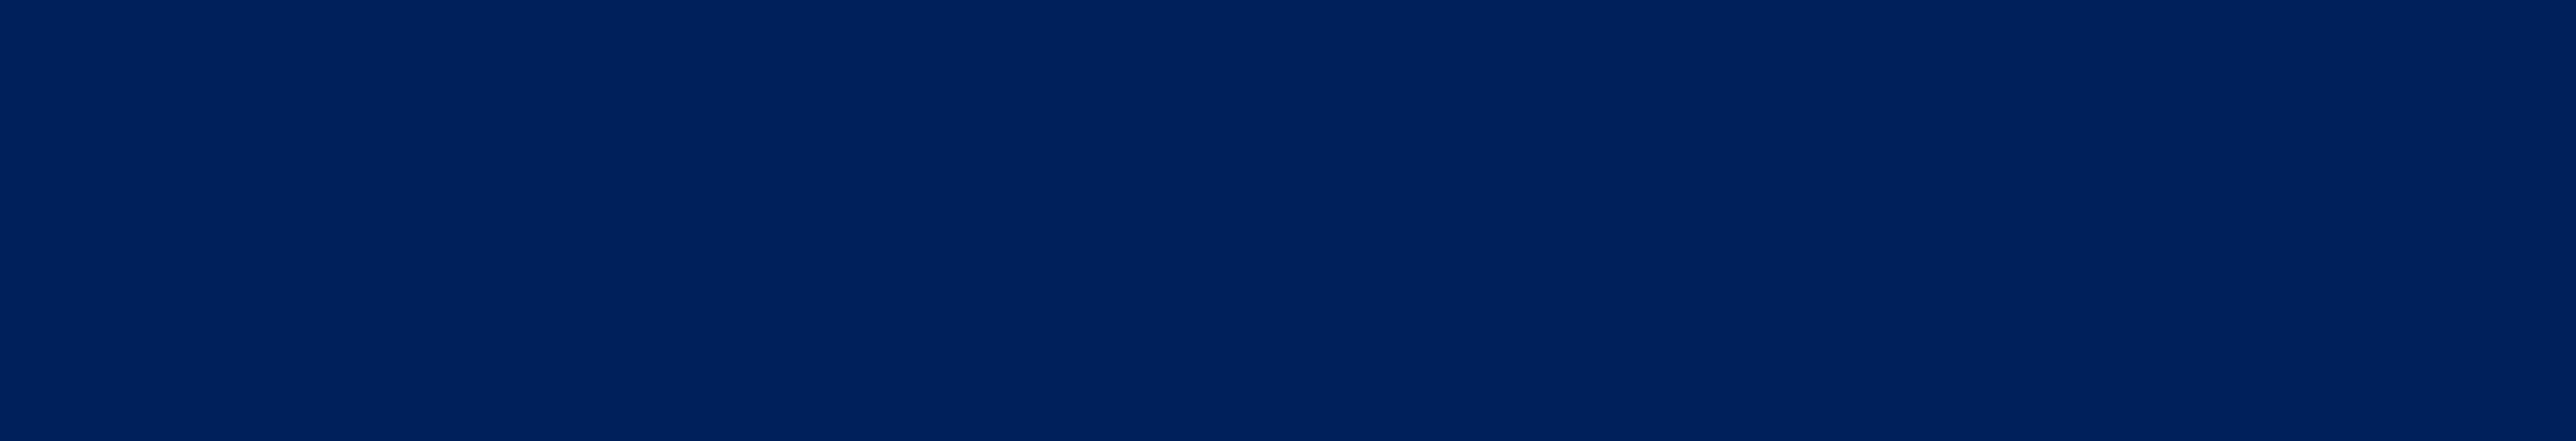 KEYSTONE DENTAL GROUP